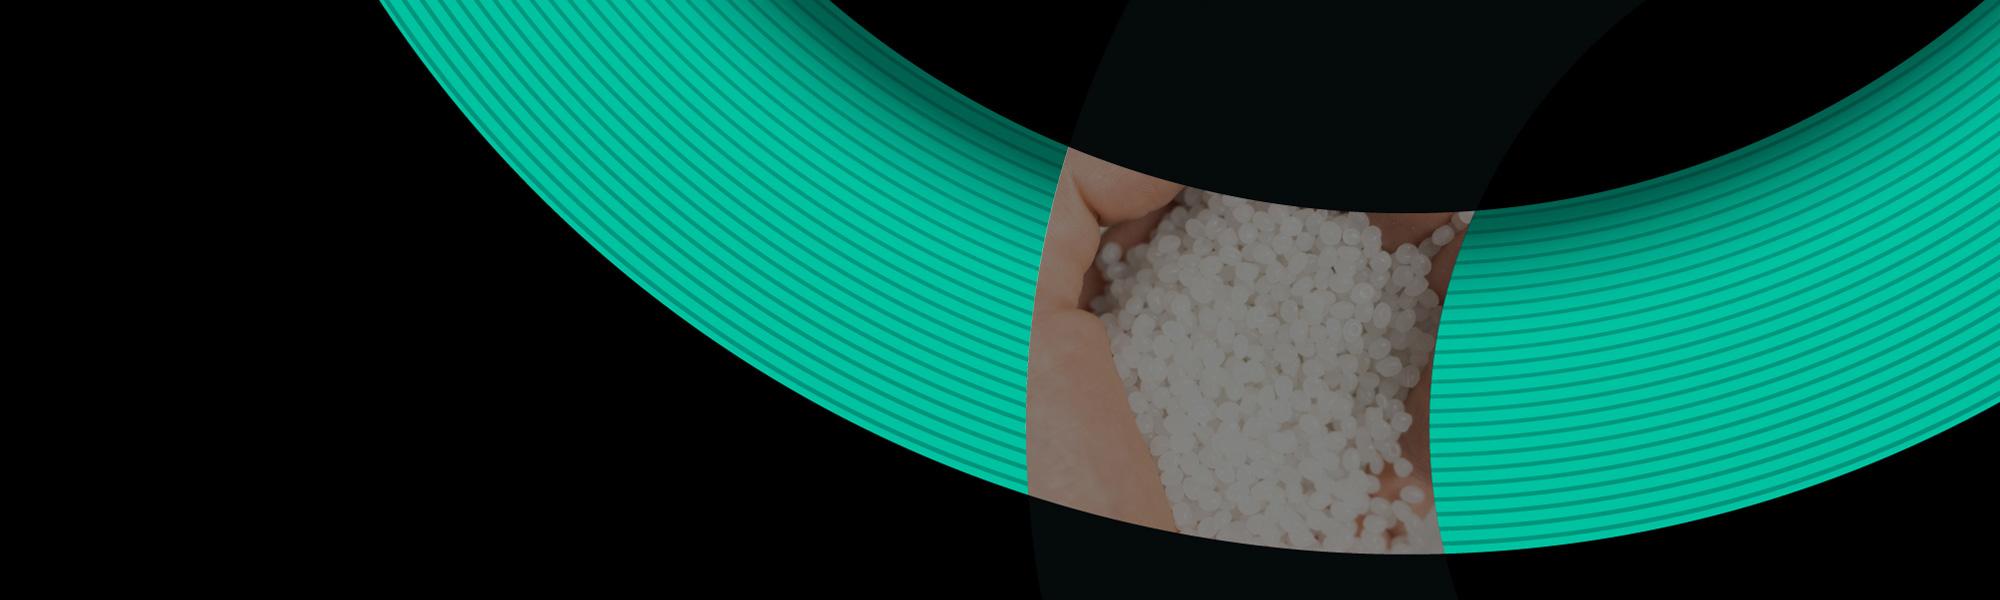 NUI TPU Thermoplastic Polyurethane